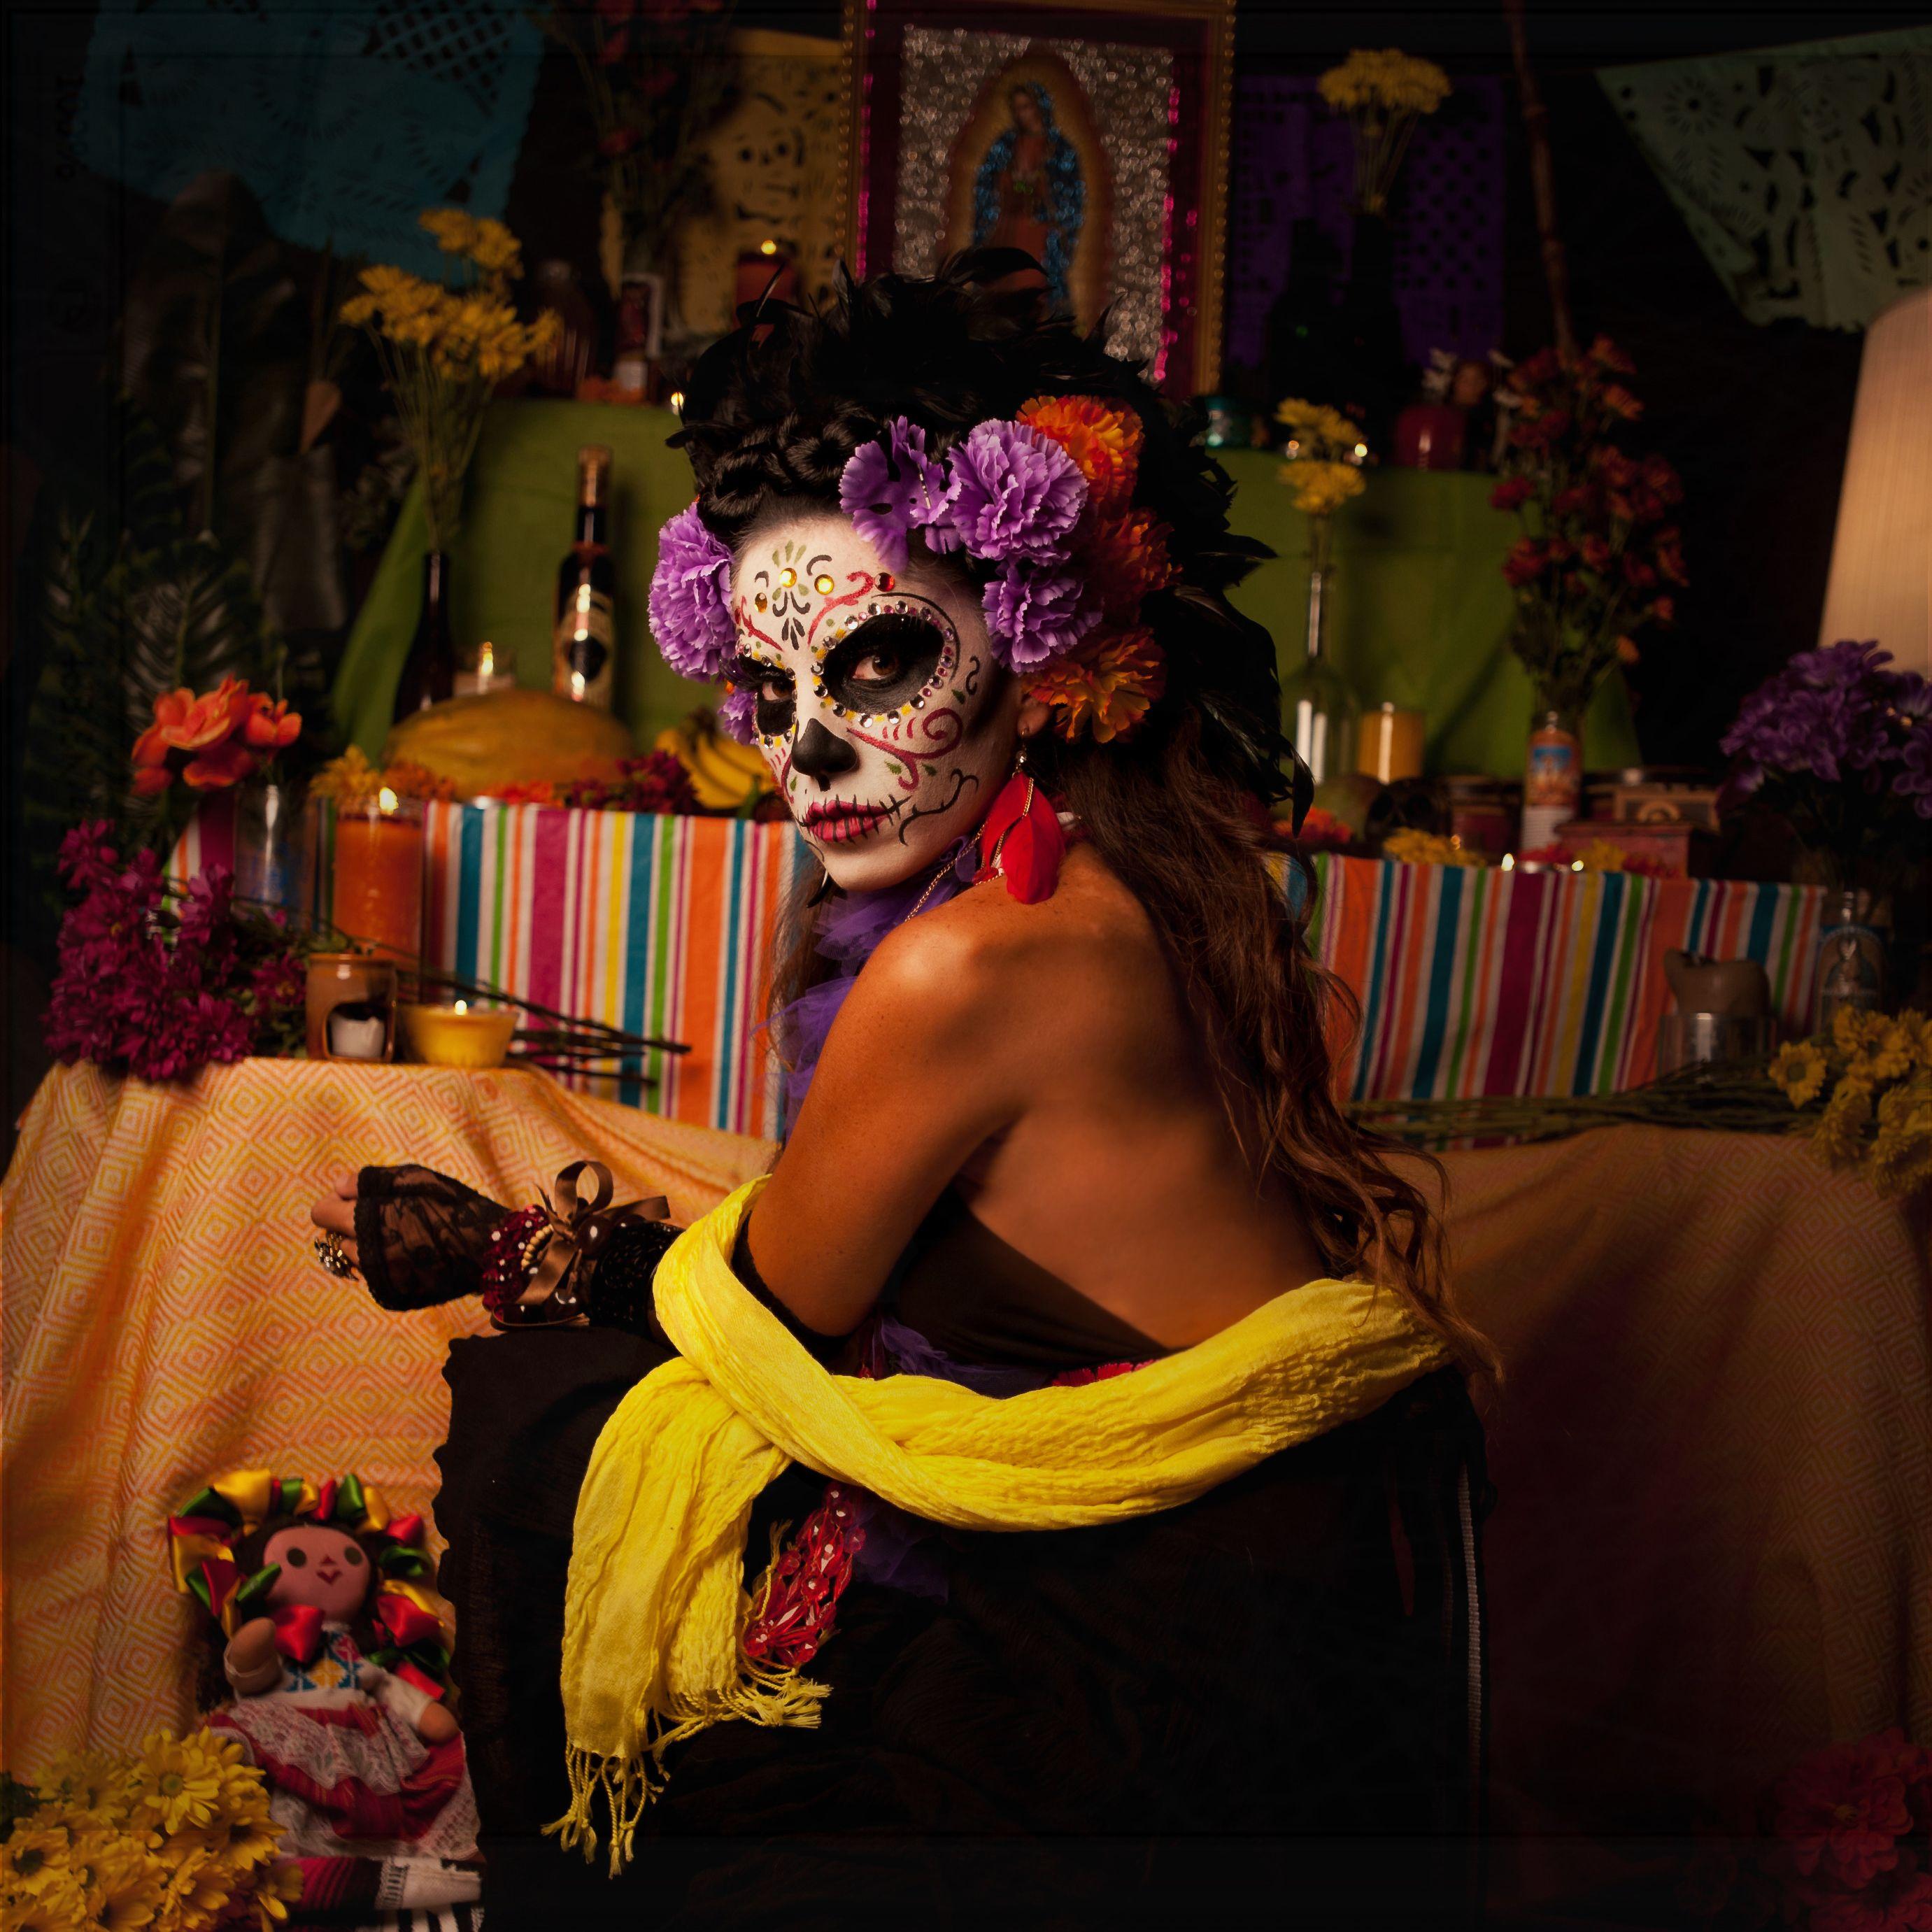 """ La Catrina "" Sugarskull Día de Muertos / Day of the Dead . Fotografía Alicia Kidd , Maquillaje Edwin Irizarry #sugarskull #dayofthedead #diademuertos #lacatrina #lolavibe www.lolavibe.com"